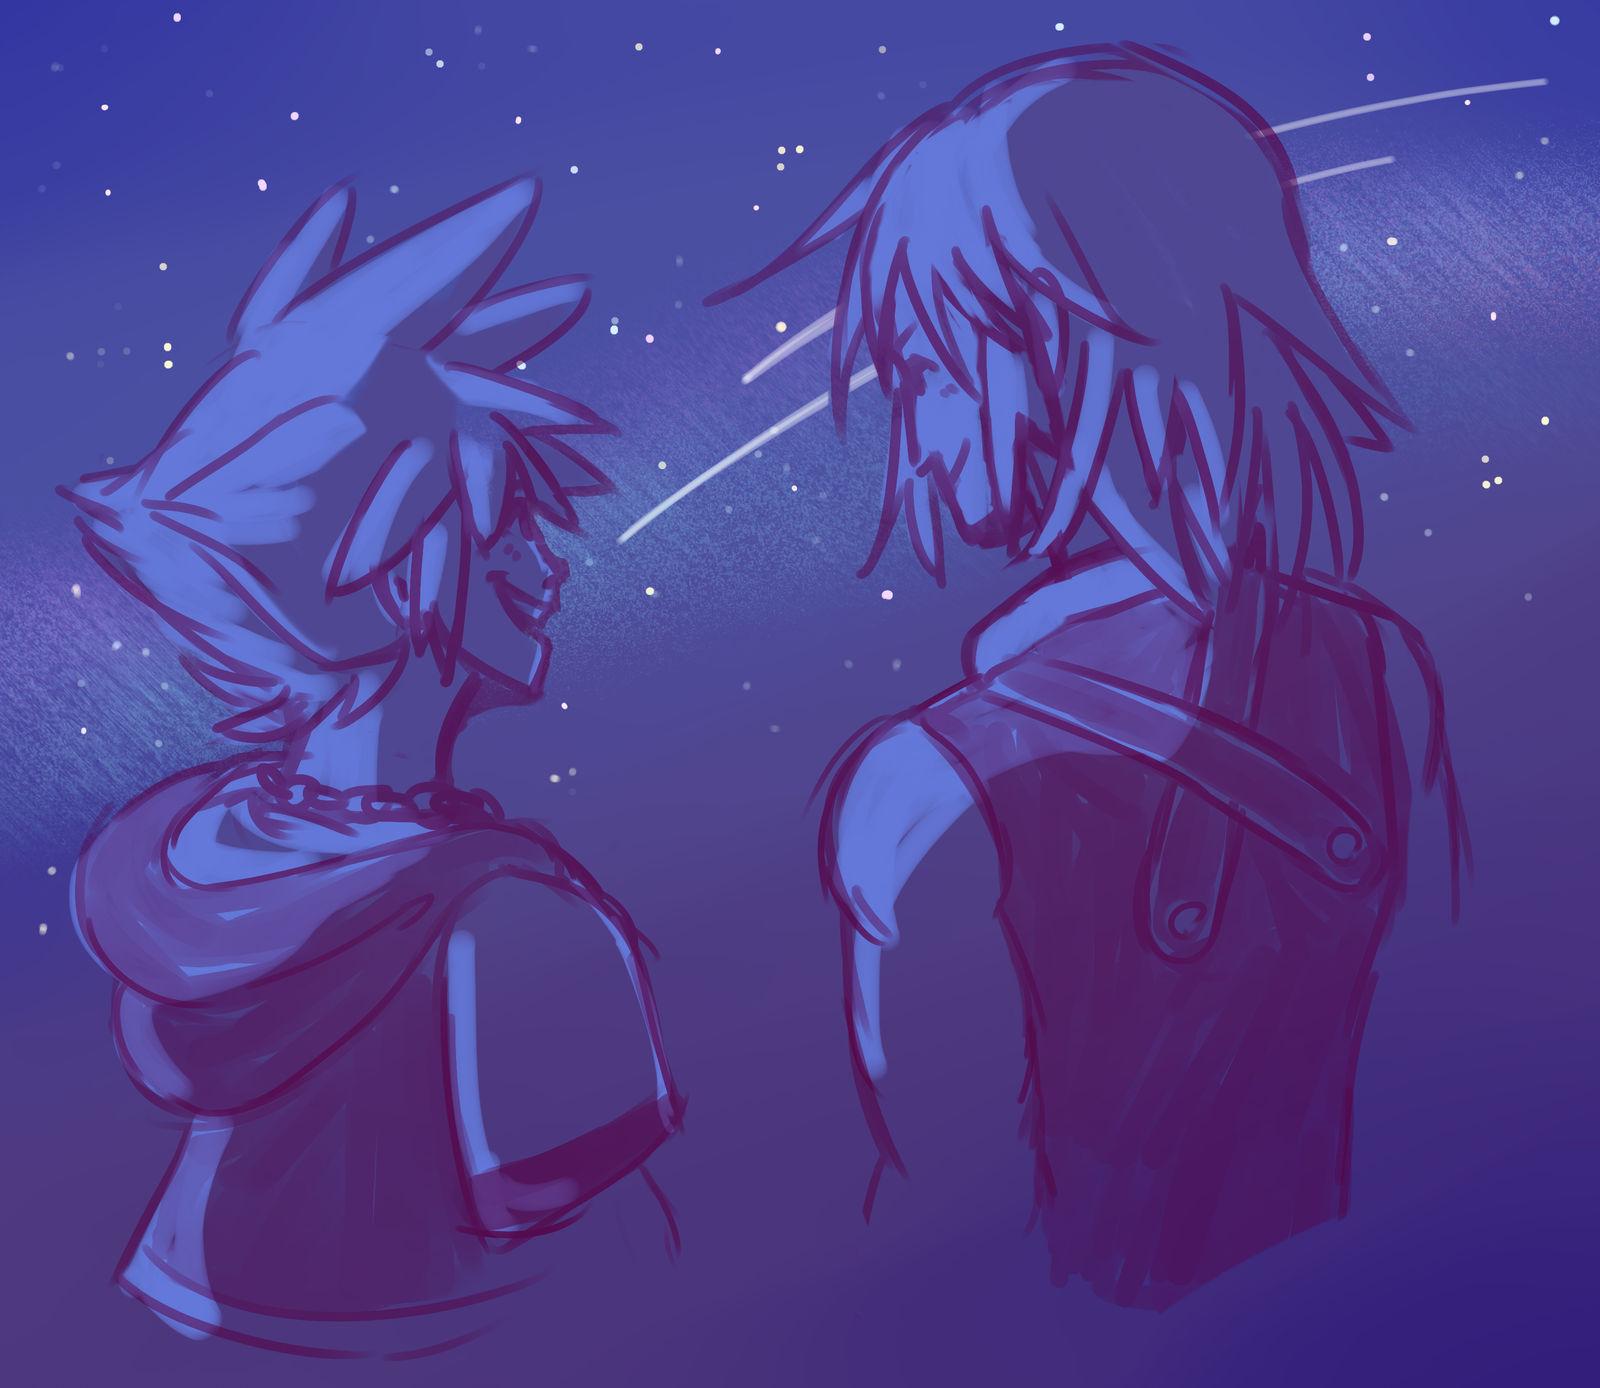 Under those stars by Nikutsune